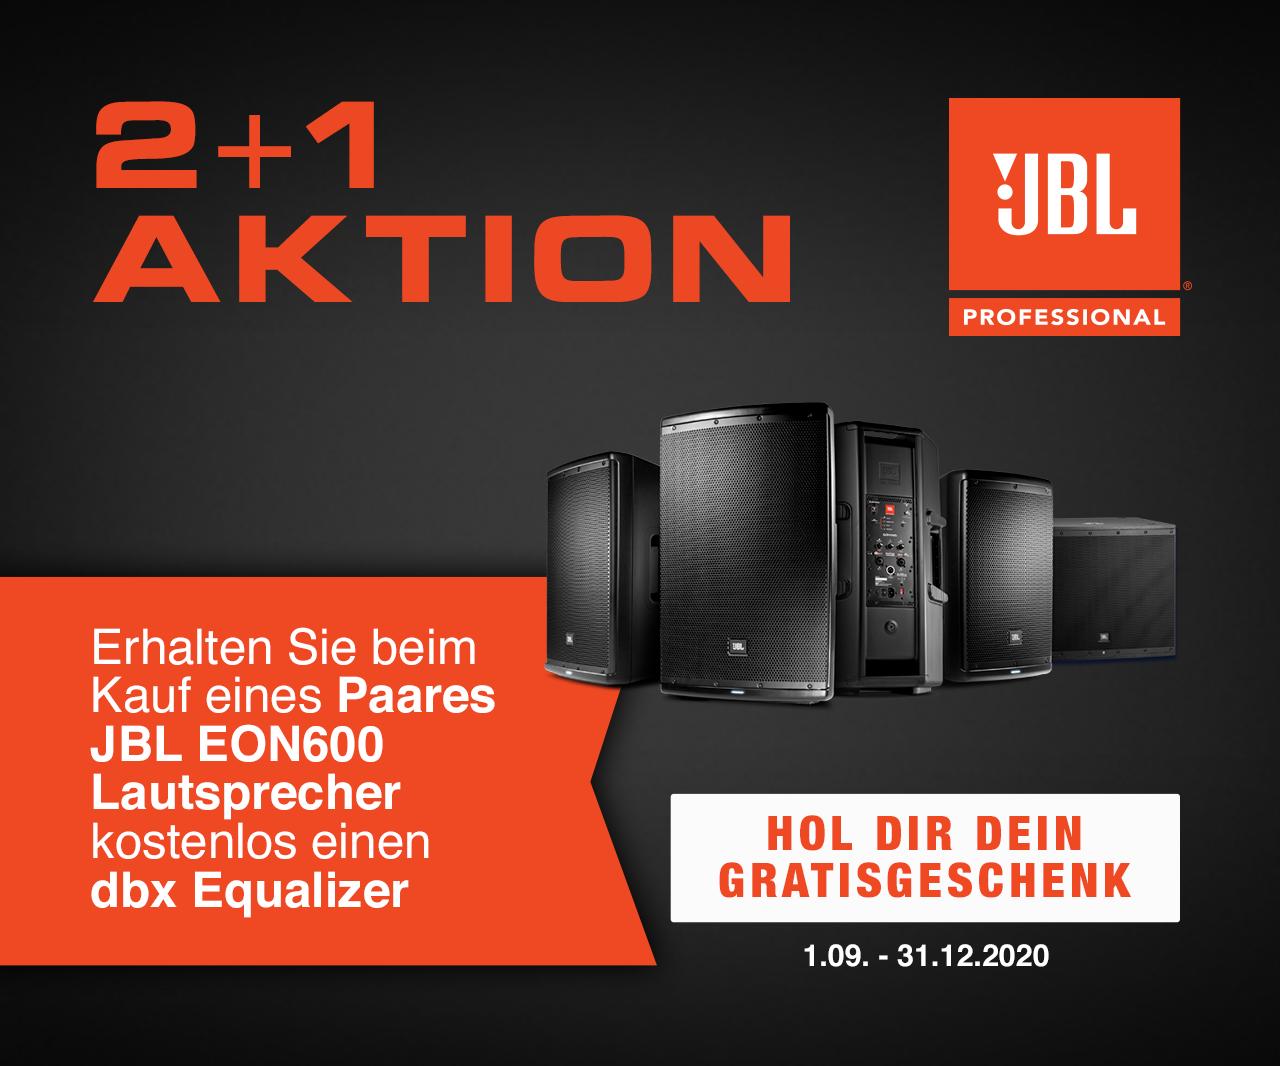 JBL EON 600 + dbx